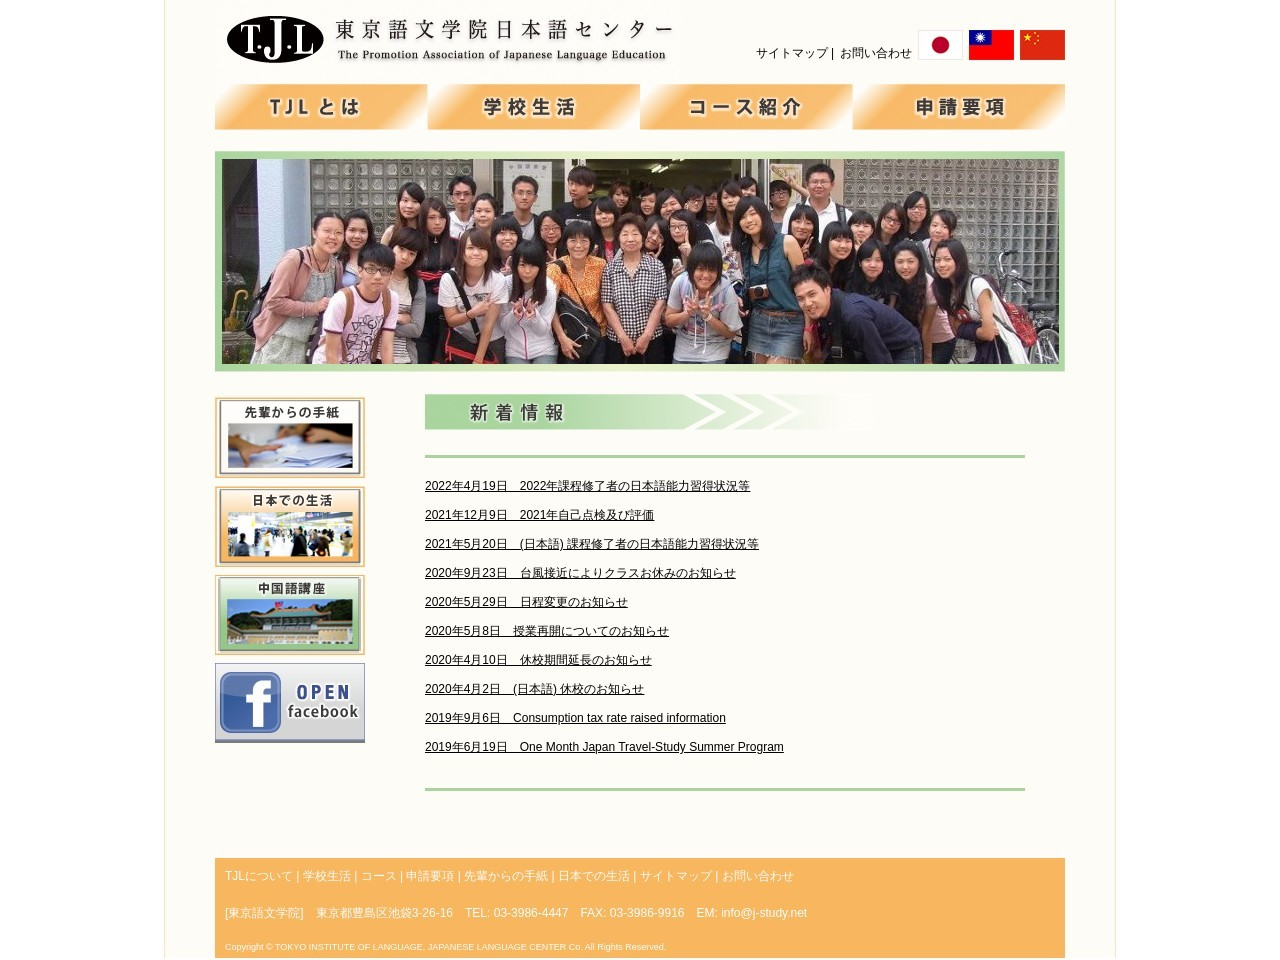 東京語文学院日本語センター